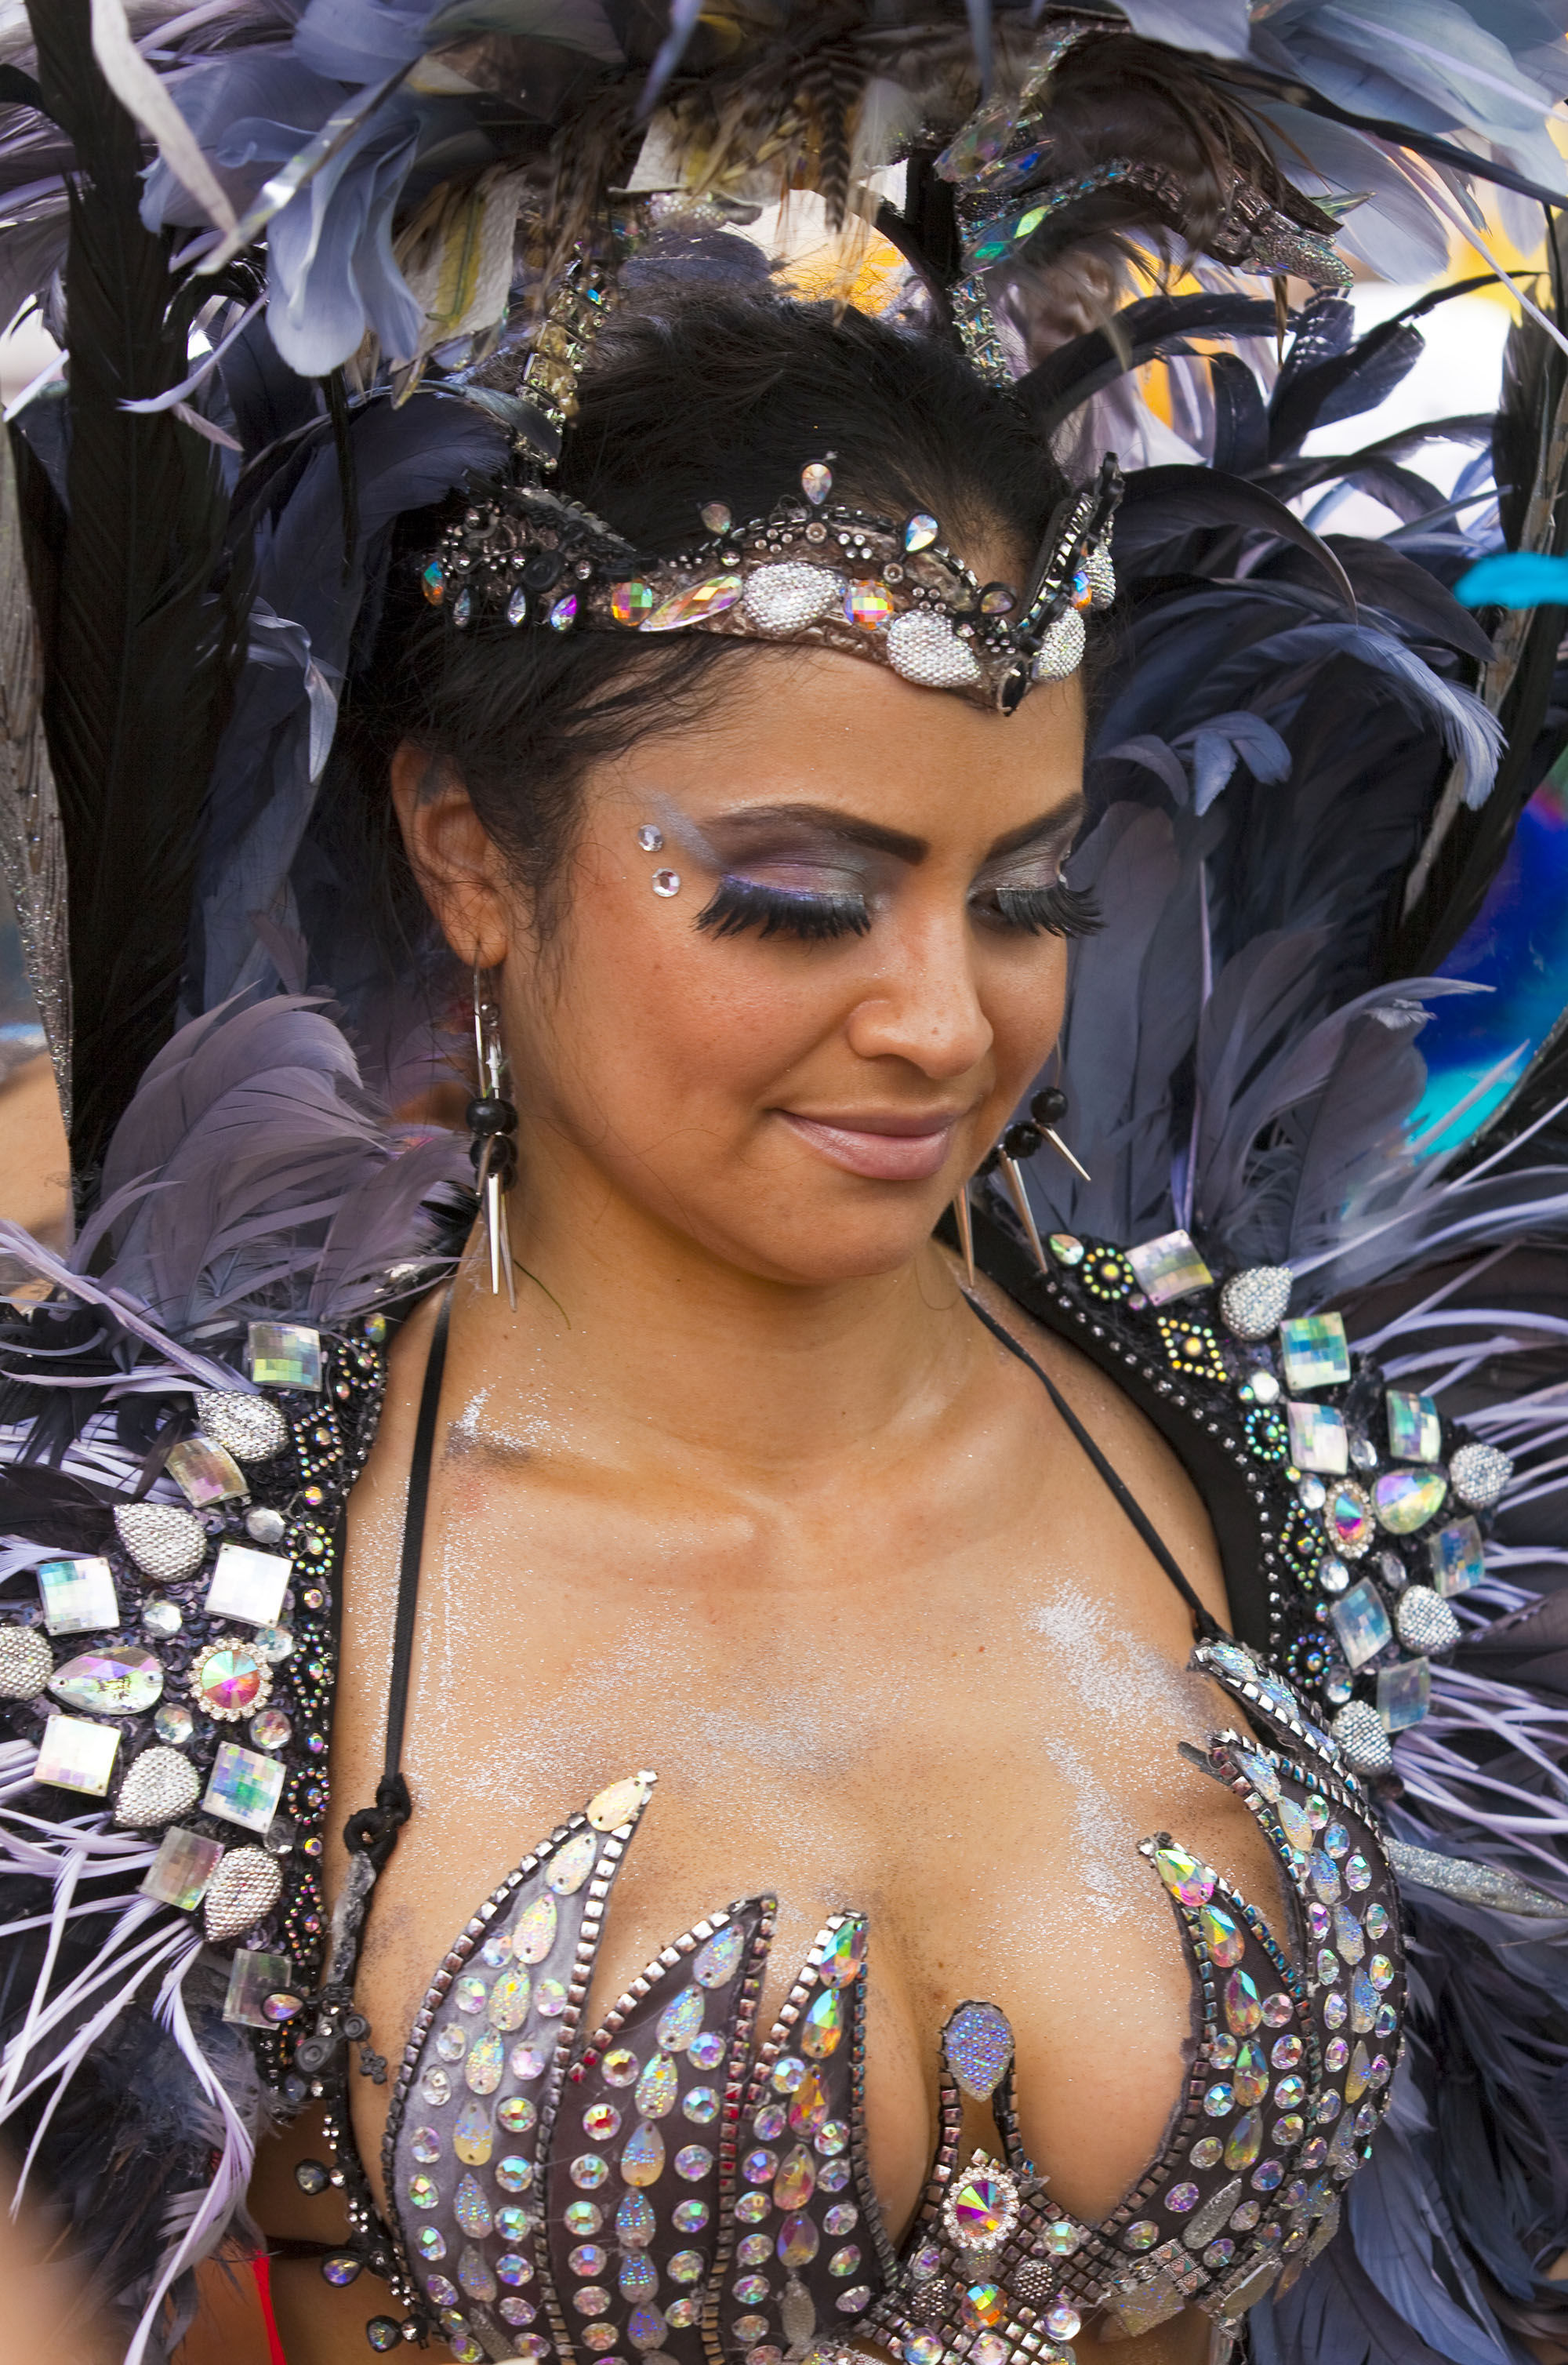 carnival_2942 copy©Jim-Raycroft.jpg